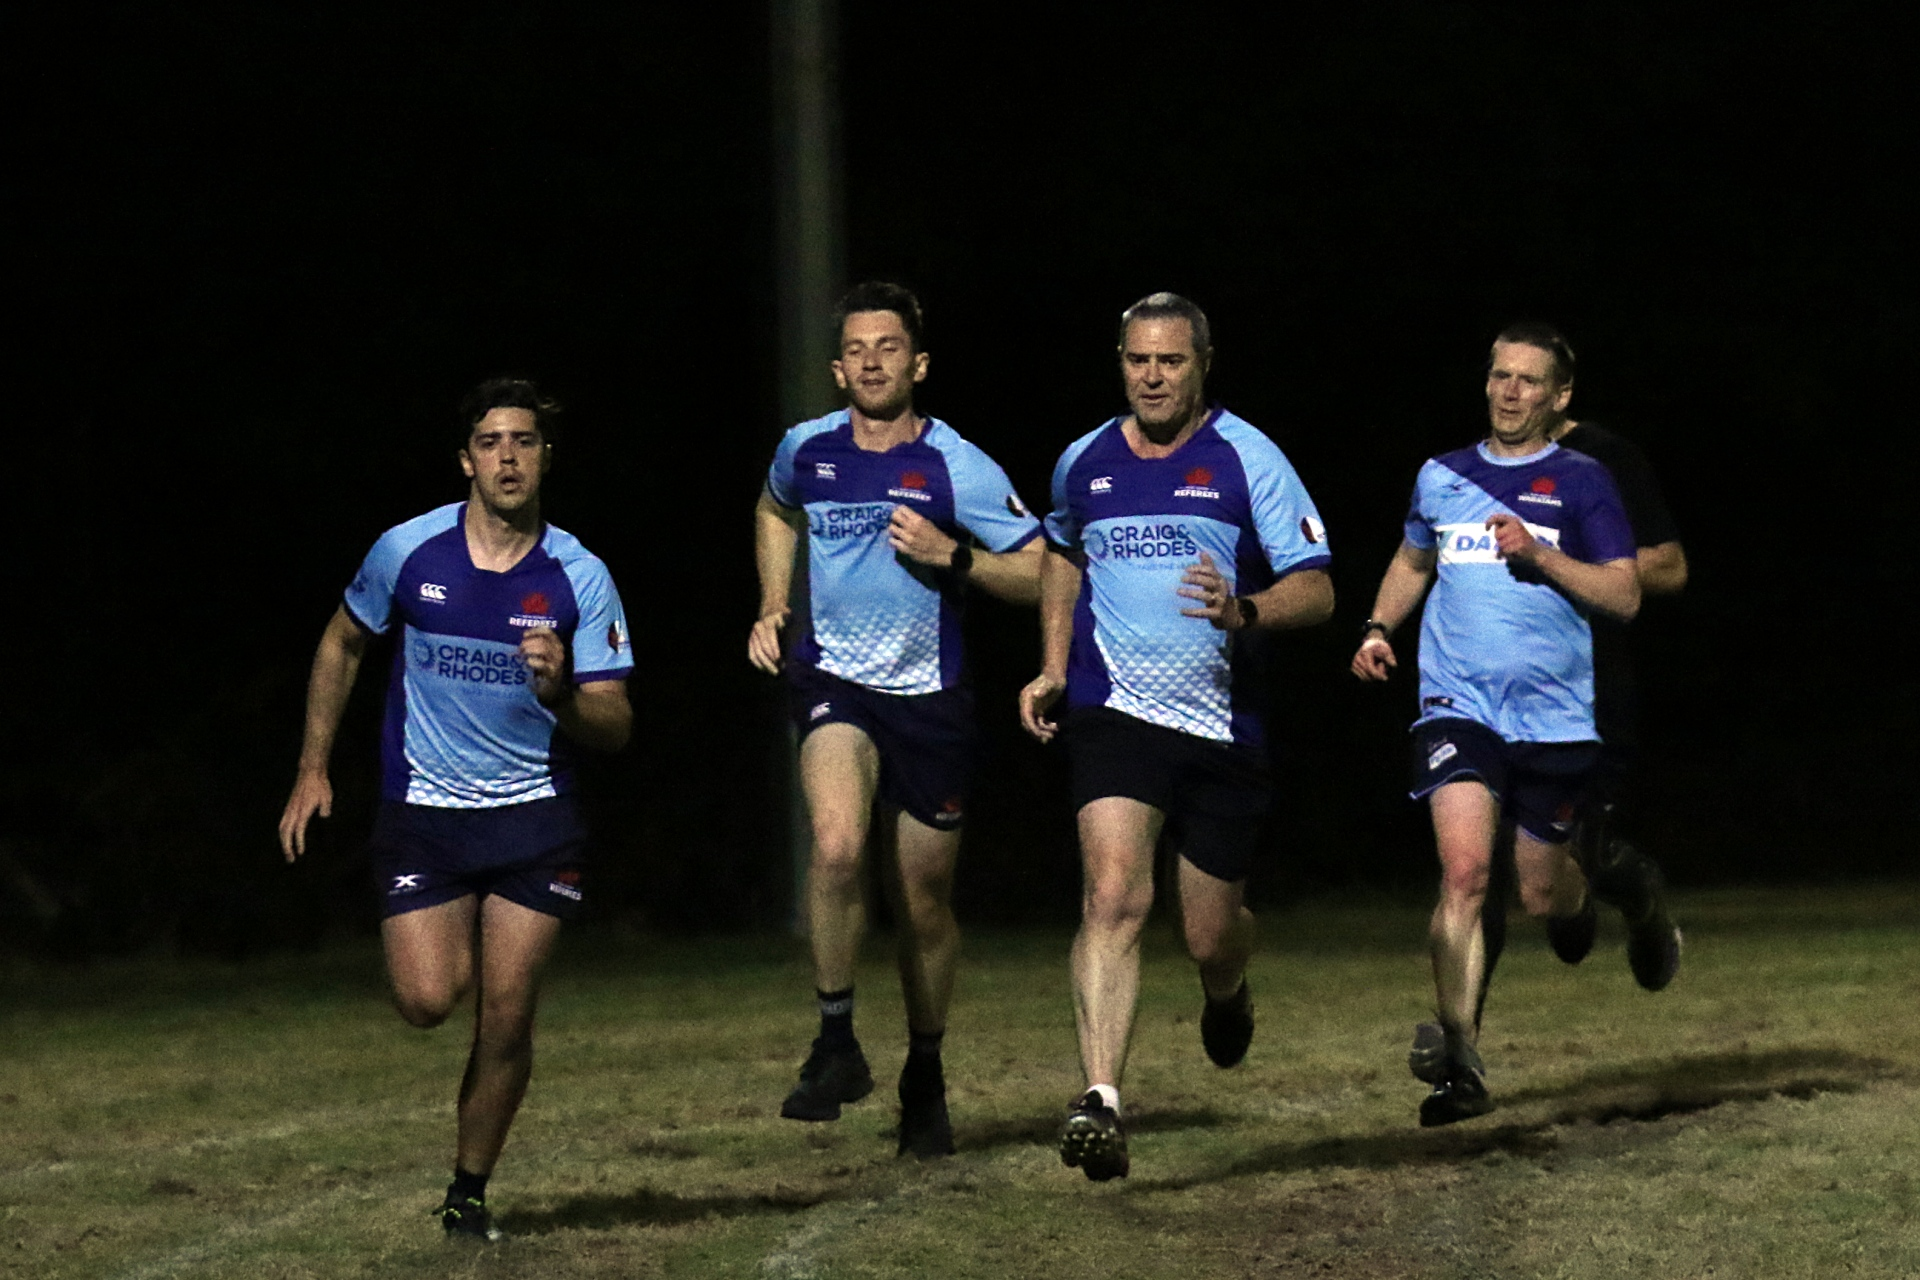 NSWRRA_training06102020_003